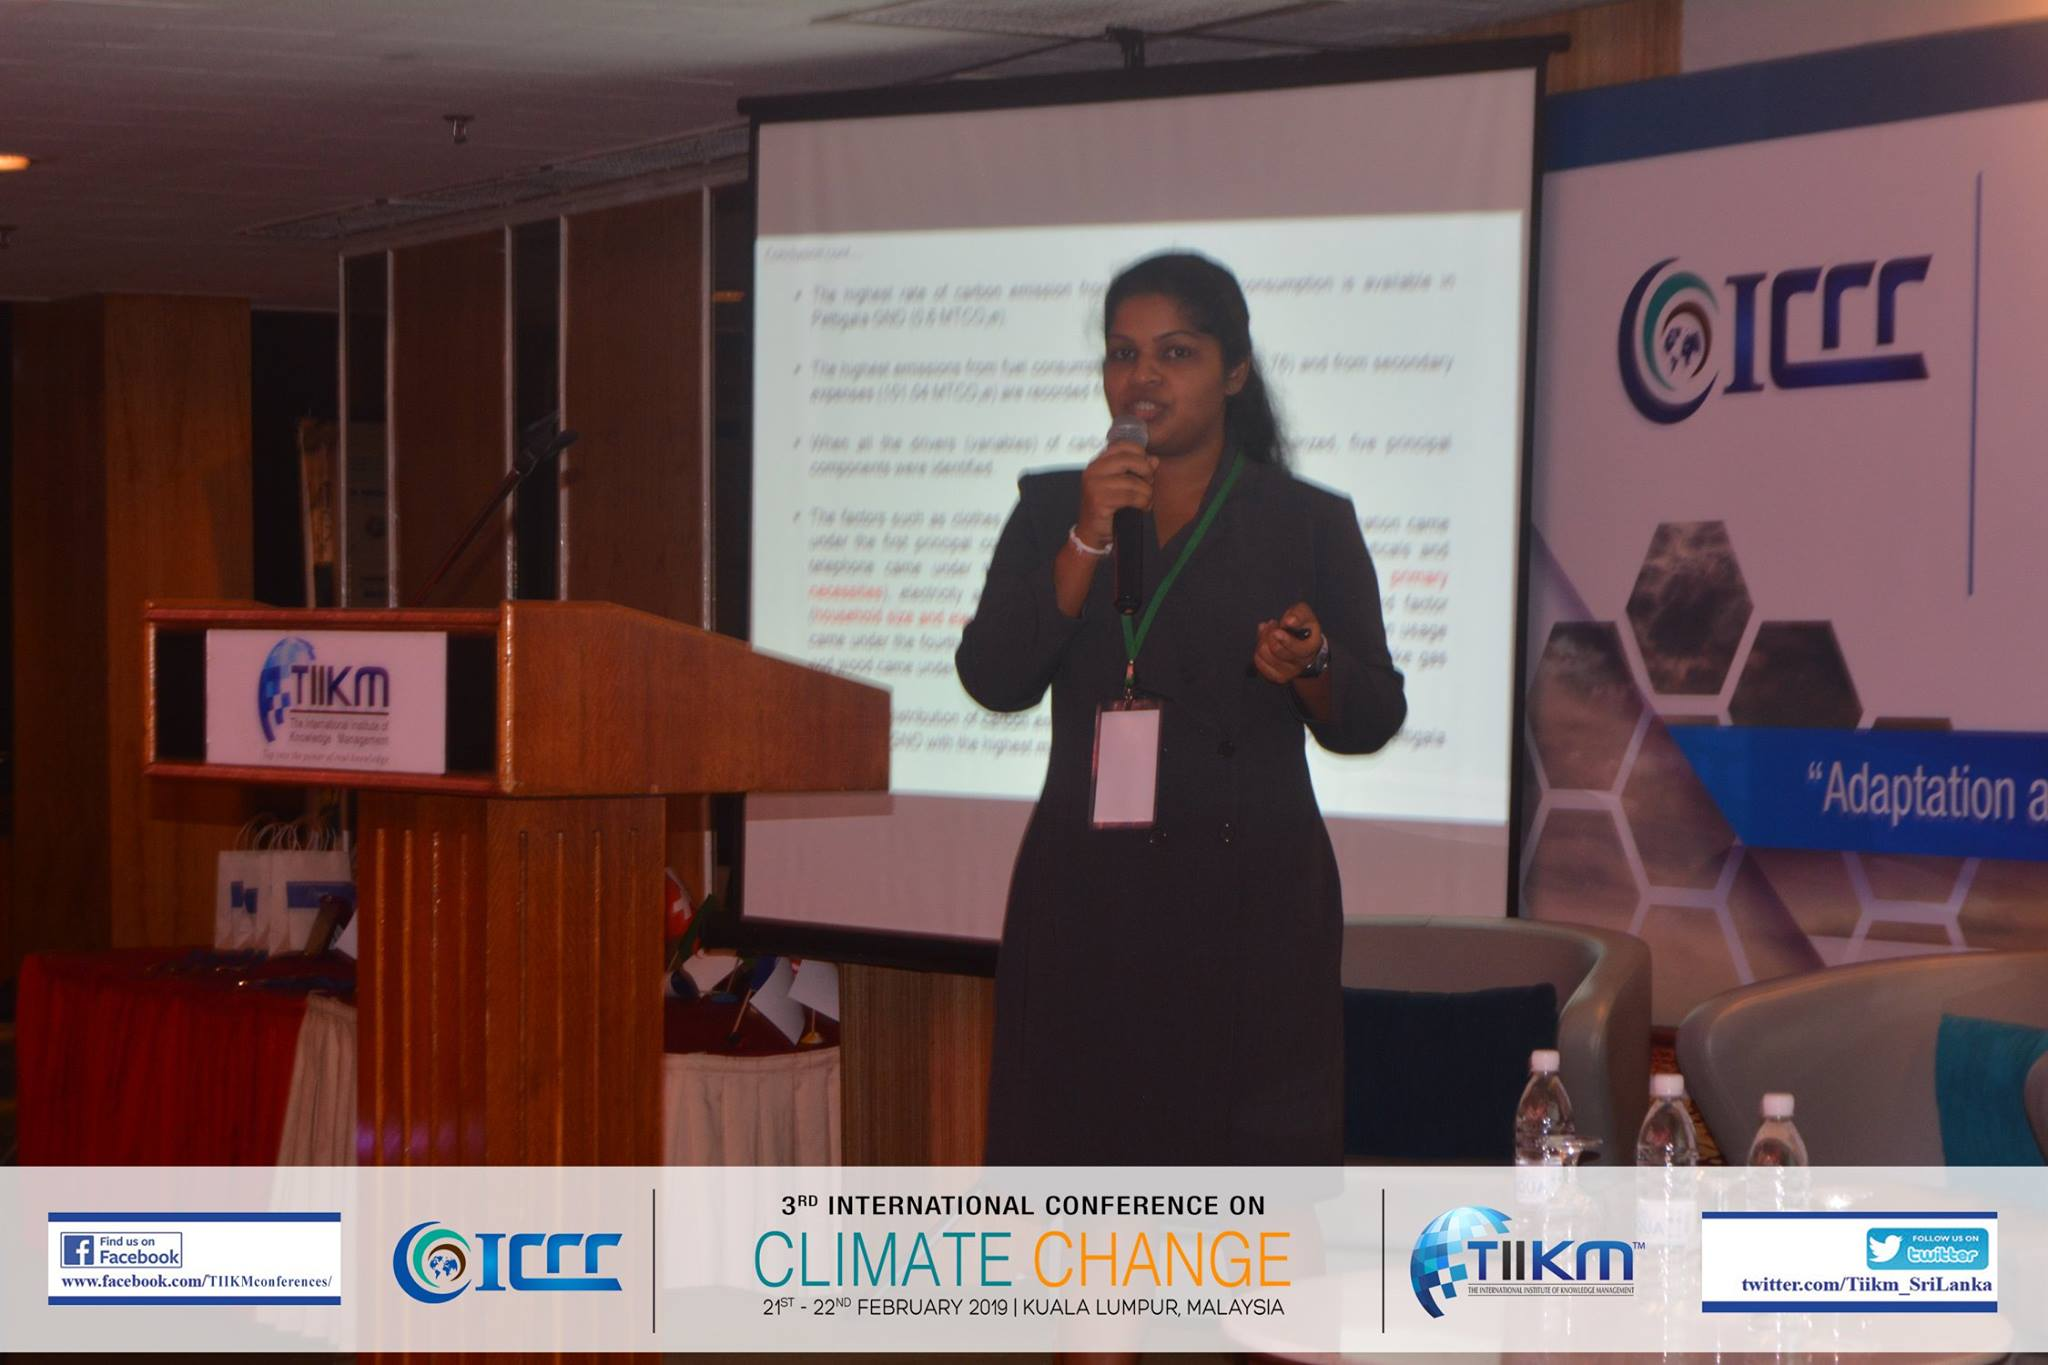 Best Presenter – 3rd International Conference of Climate Change (ICCC 2019) – Ms. K.L.W.I. Gunathilake